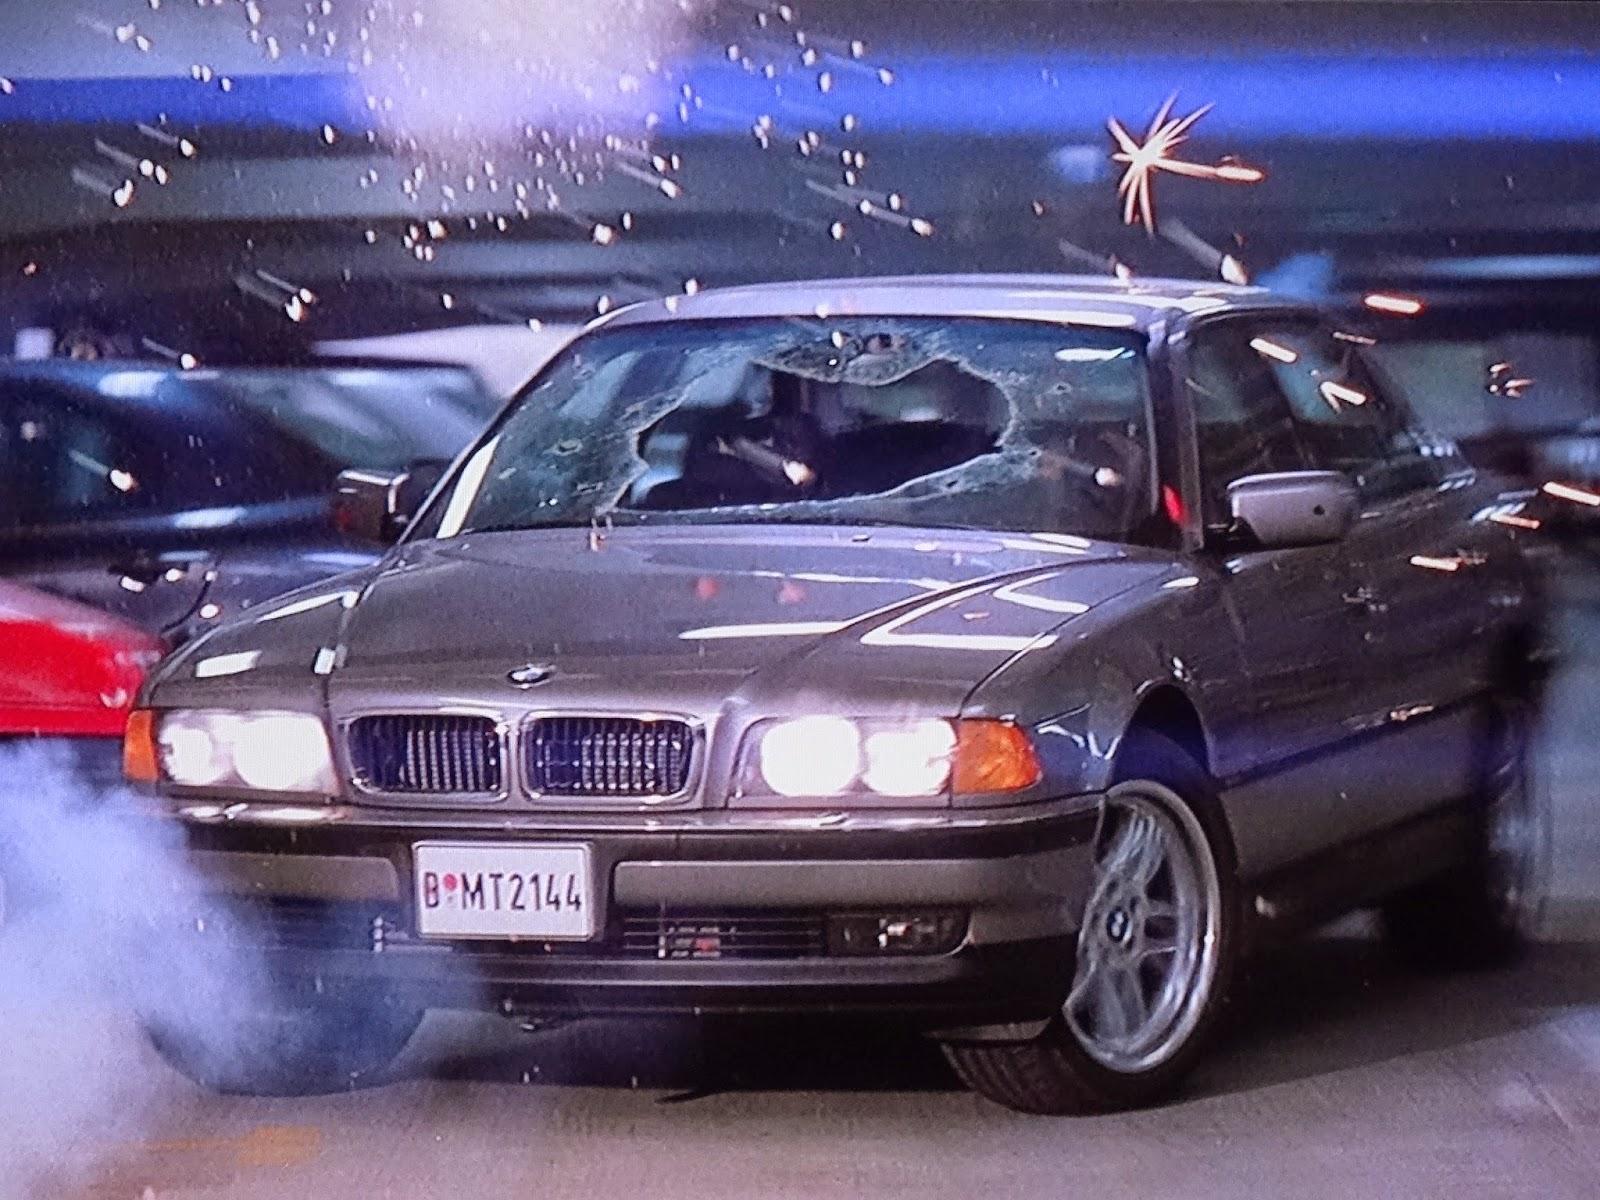 007 Travelers 007 Vehicle Bmw 750il Tomorrow Never Dies 1997